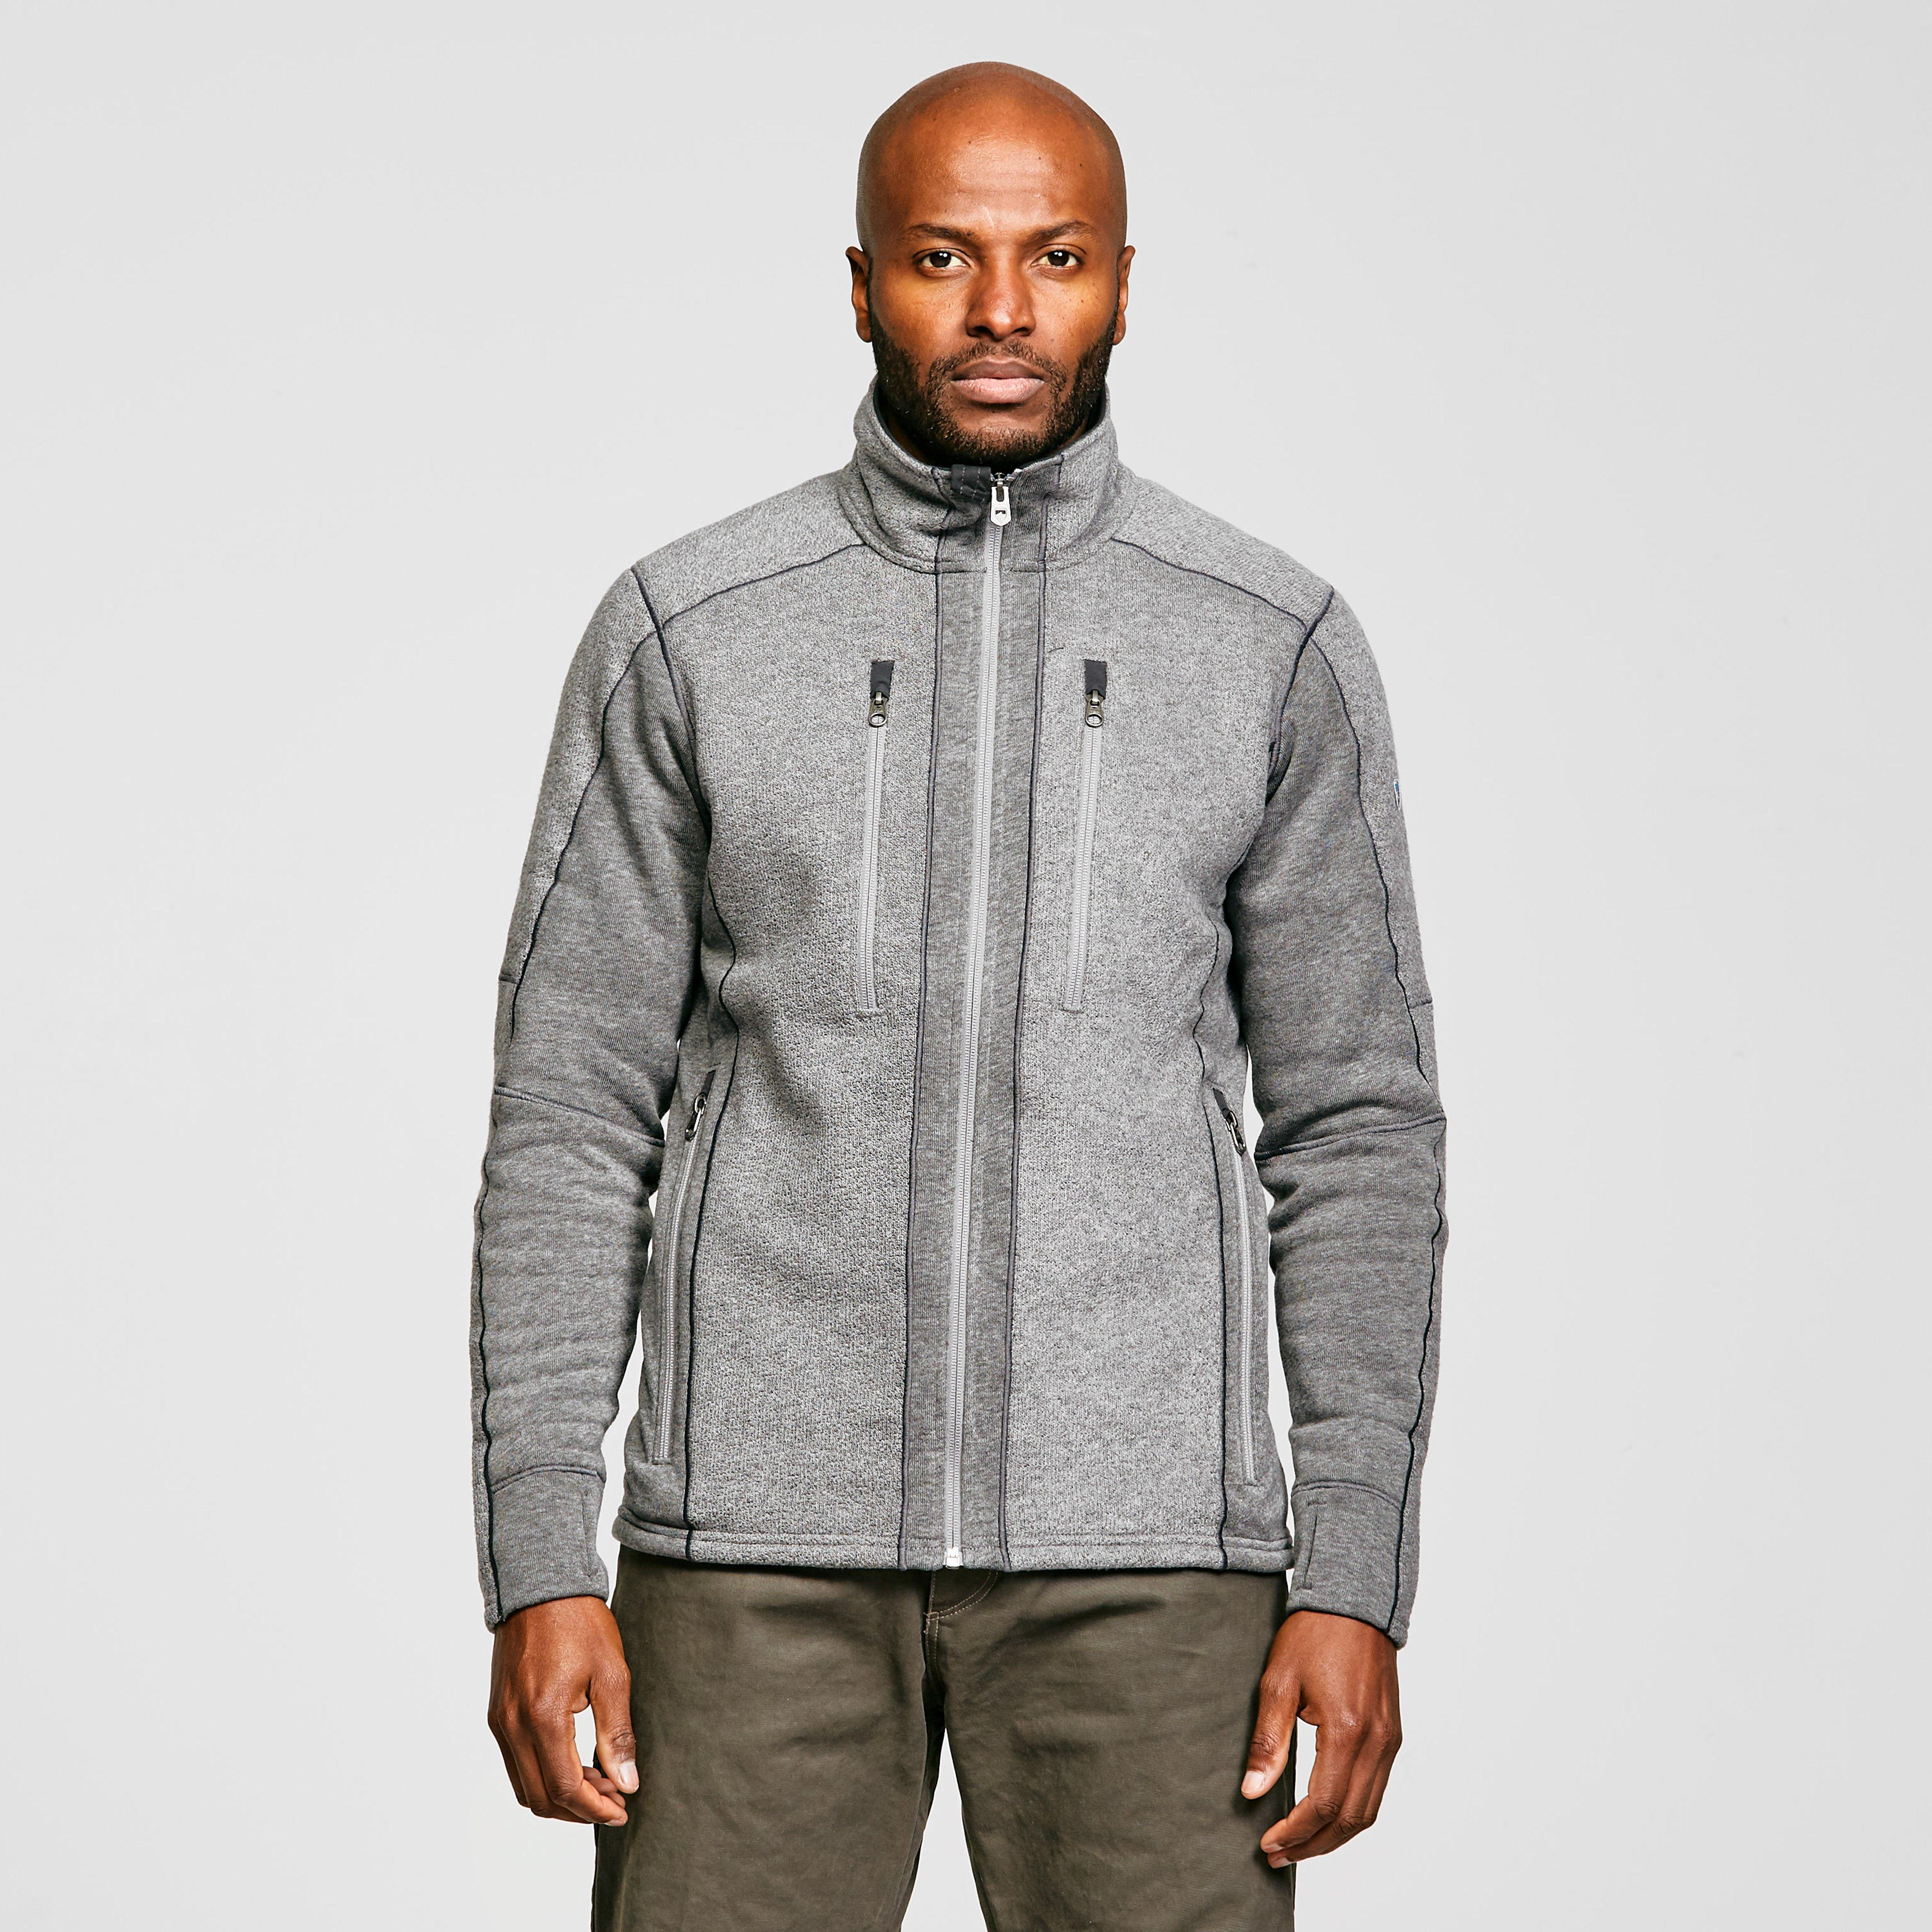 Kuhl Kuhl Mens Interceptr Fleece Jacket - Grey, Grey